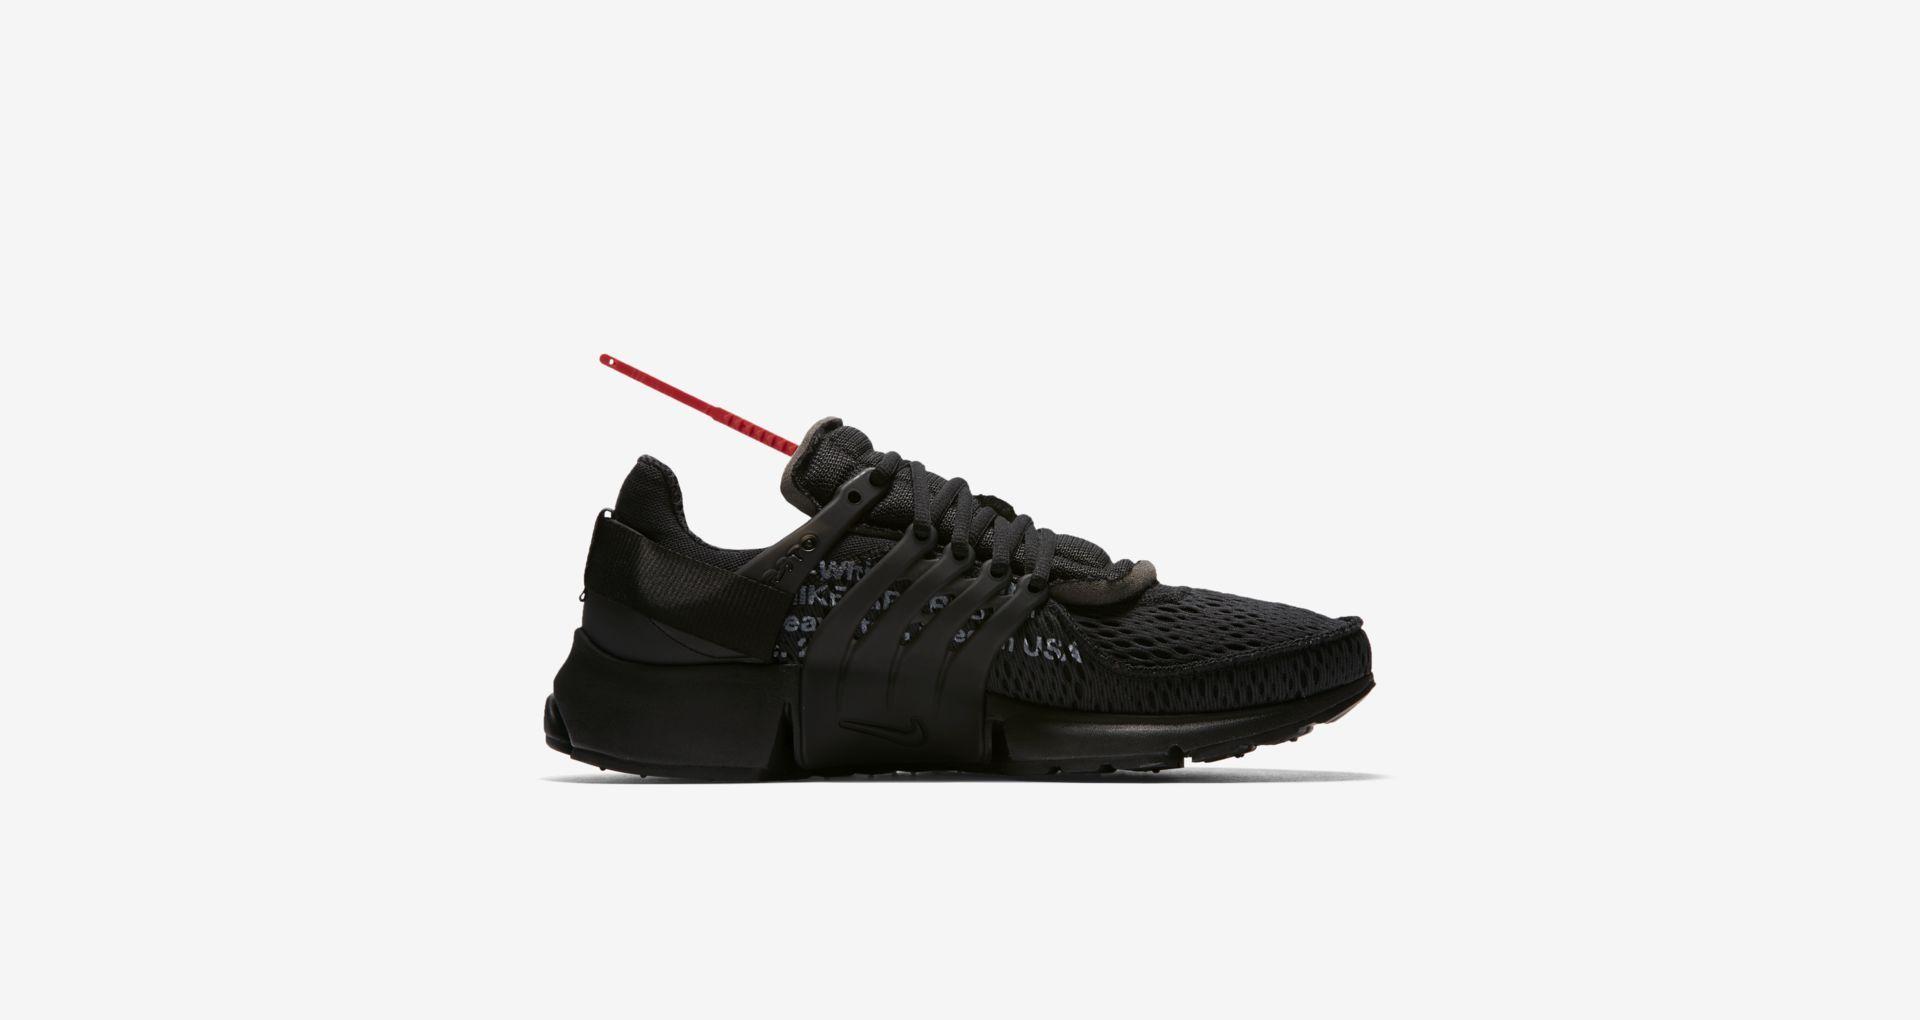 Off Weiß x Nike Nike x Air Presto schwarz in 2018 Sneaker Pinterest 84adf7